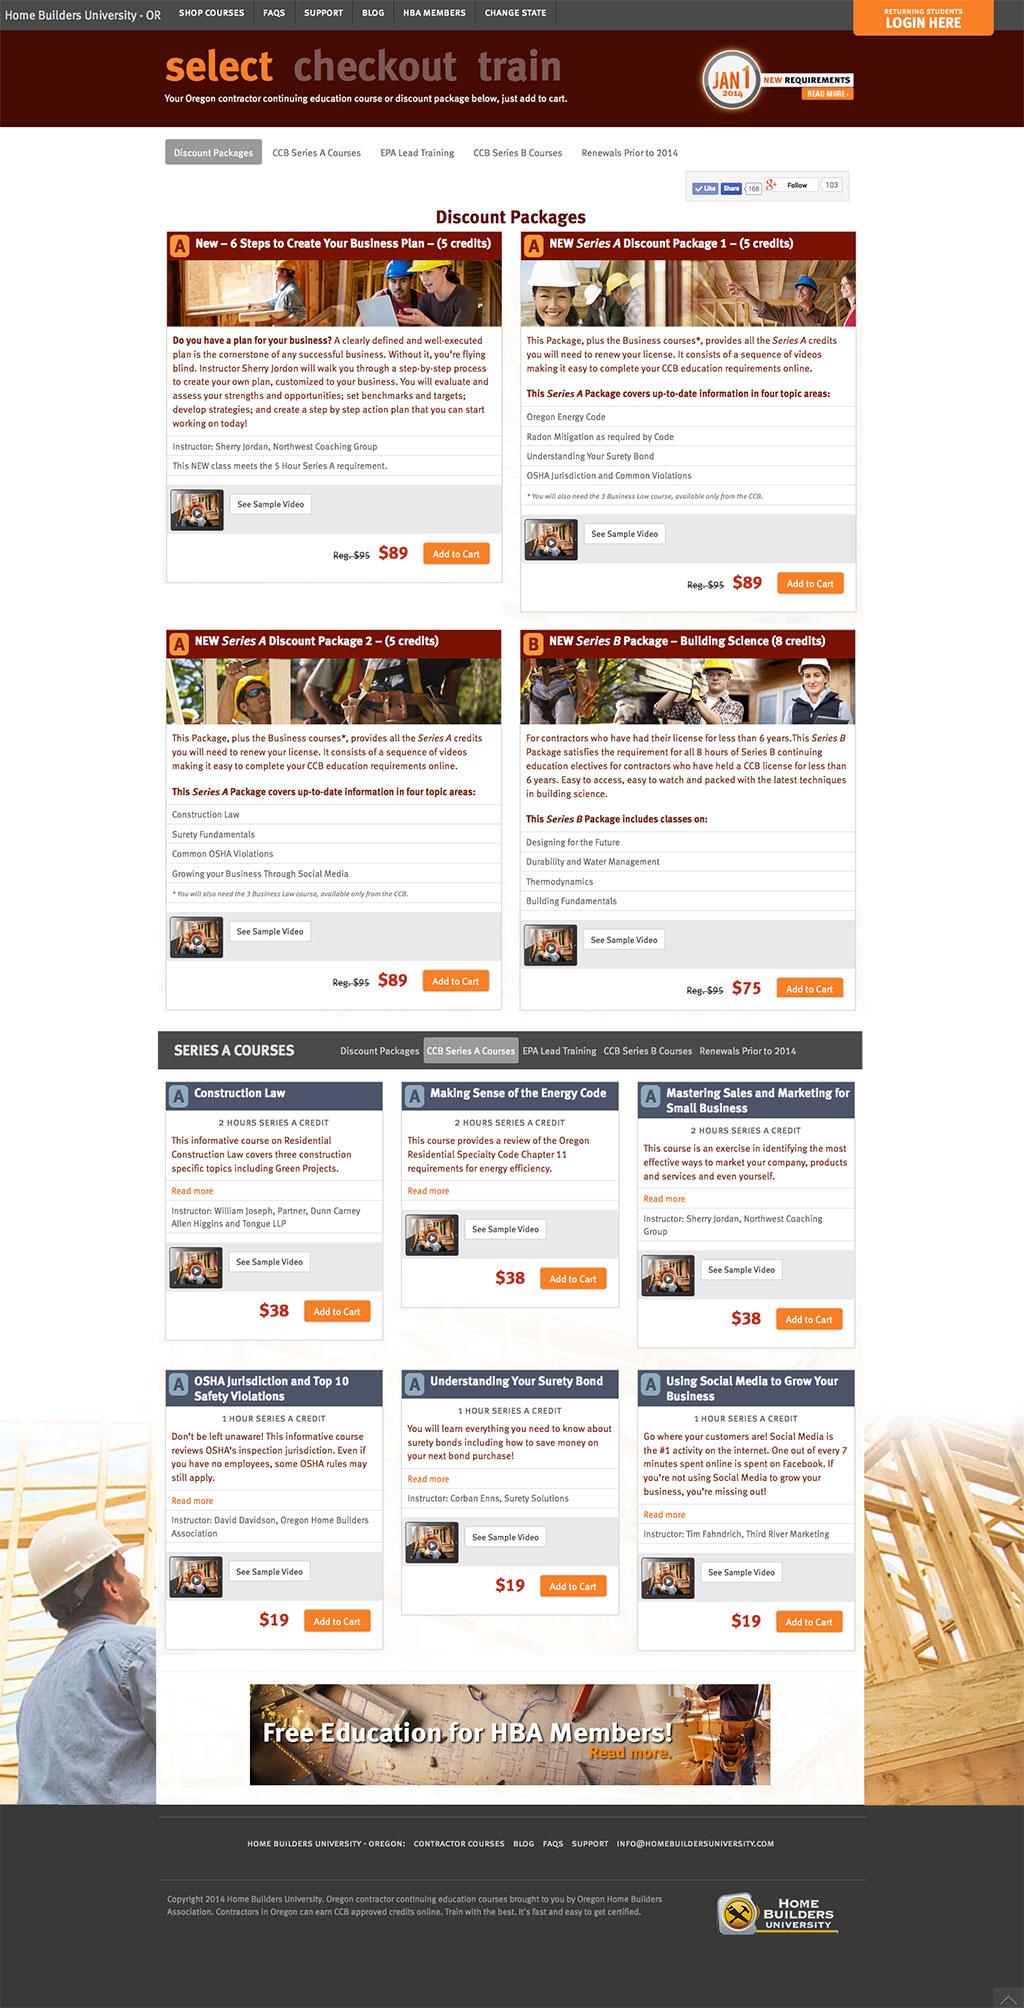 website design salem oregon - home builders university